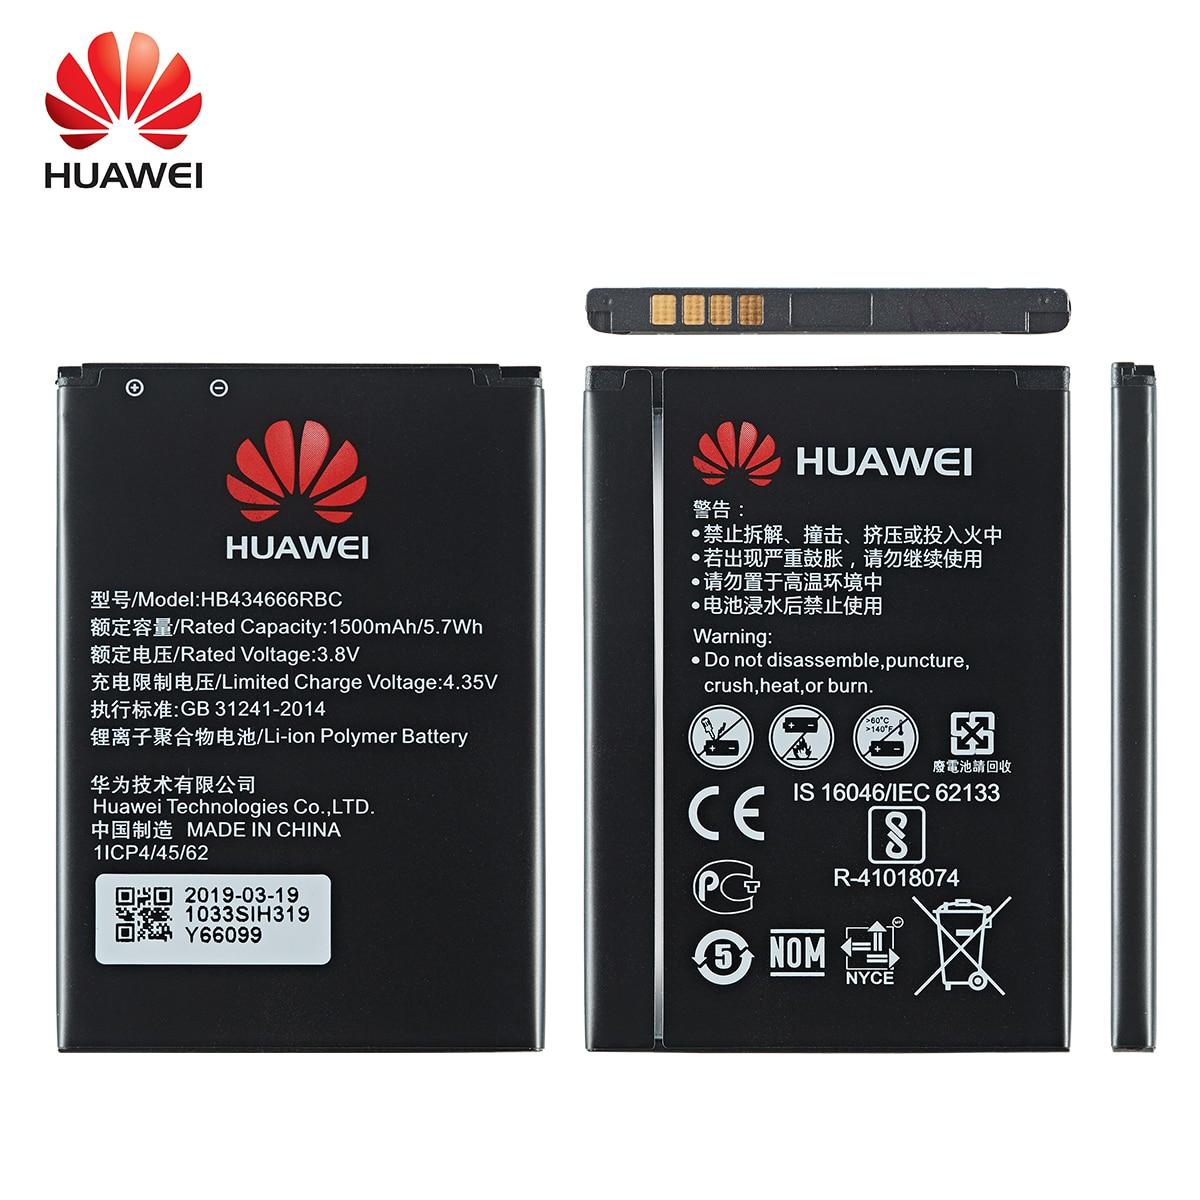 100% Orginal HB434666RBC Phone Battery 1500mAh For Huawei  Router E5573 E5573S E5573s-32 E5573s-320 E5573s-606 E5573s-806